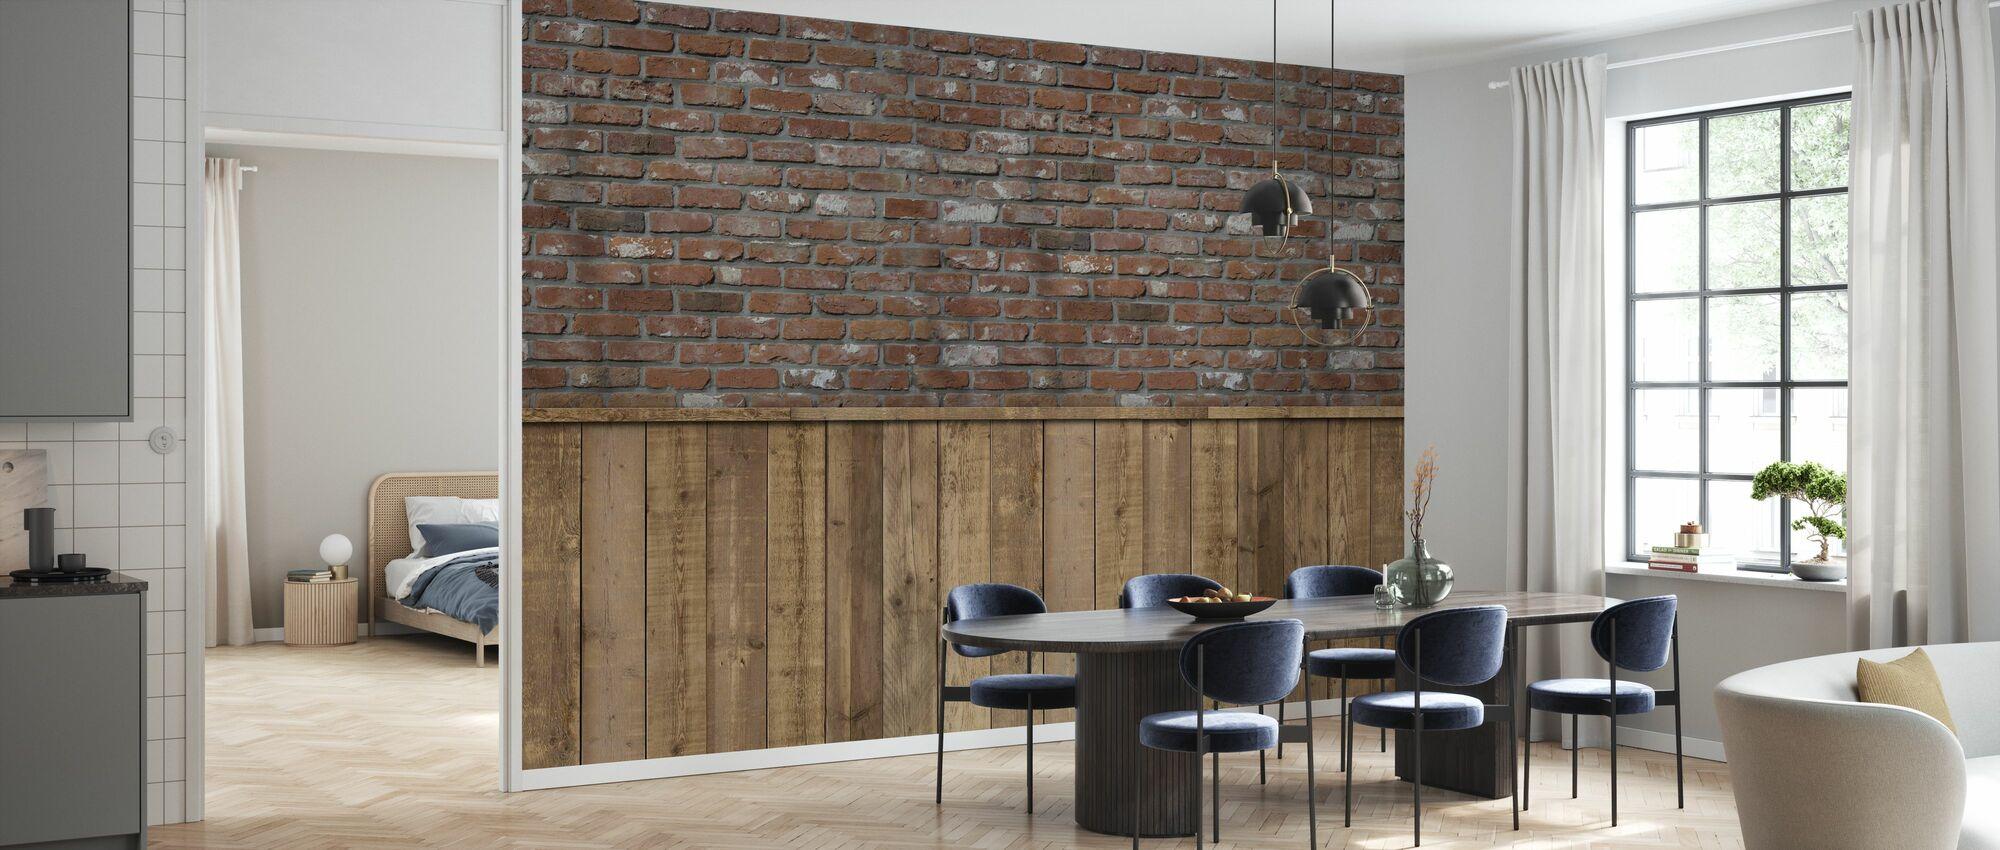 Rough Store Wall III - Tapete - Küchen